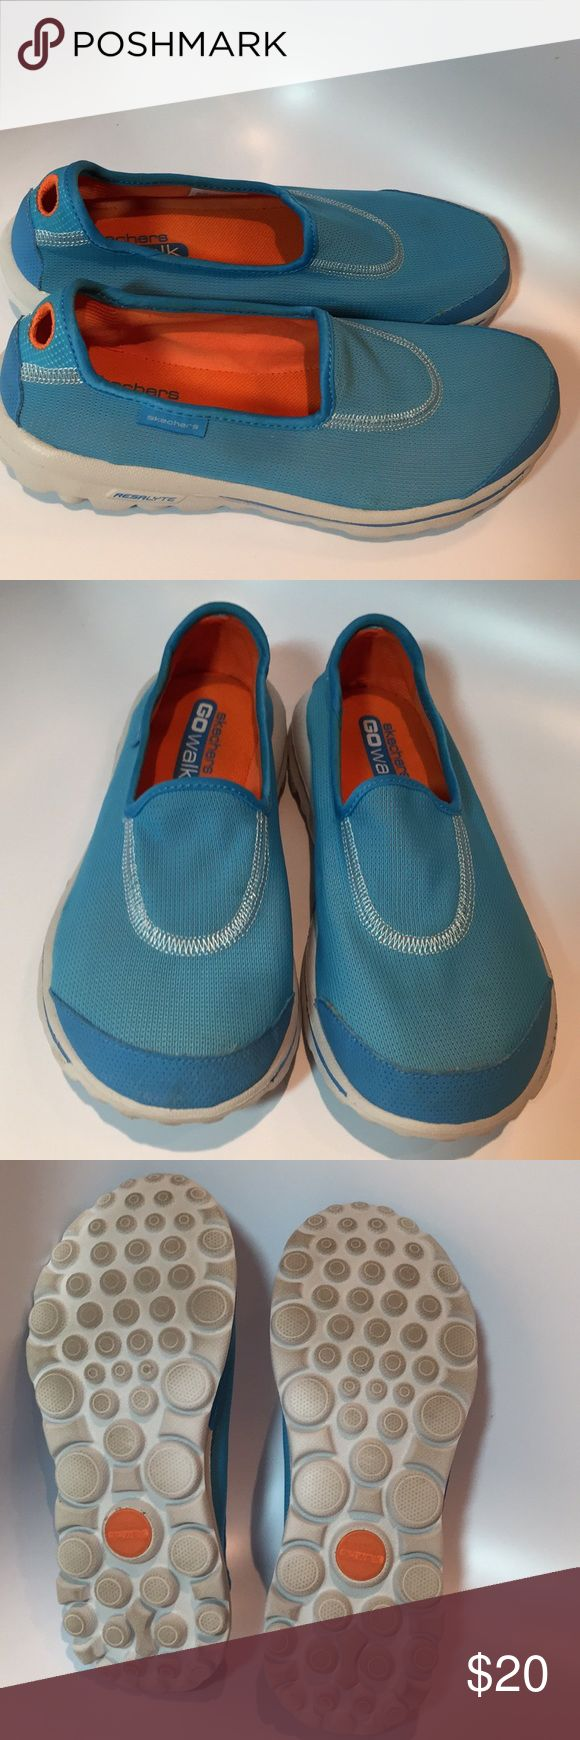 "Skechers ""GO walk"" slip-on Shoes. Very good condition baby blue Skechers ""GO walk"" slip-on Shoes. Size 6.5. Skechers Shoes Sneakers"